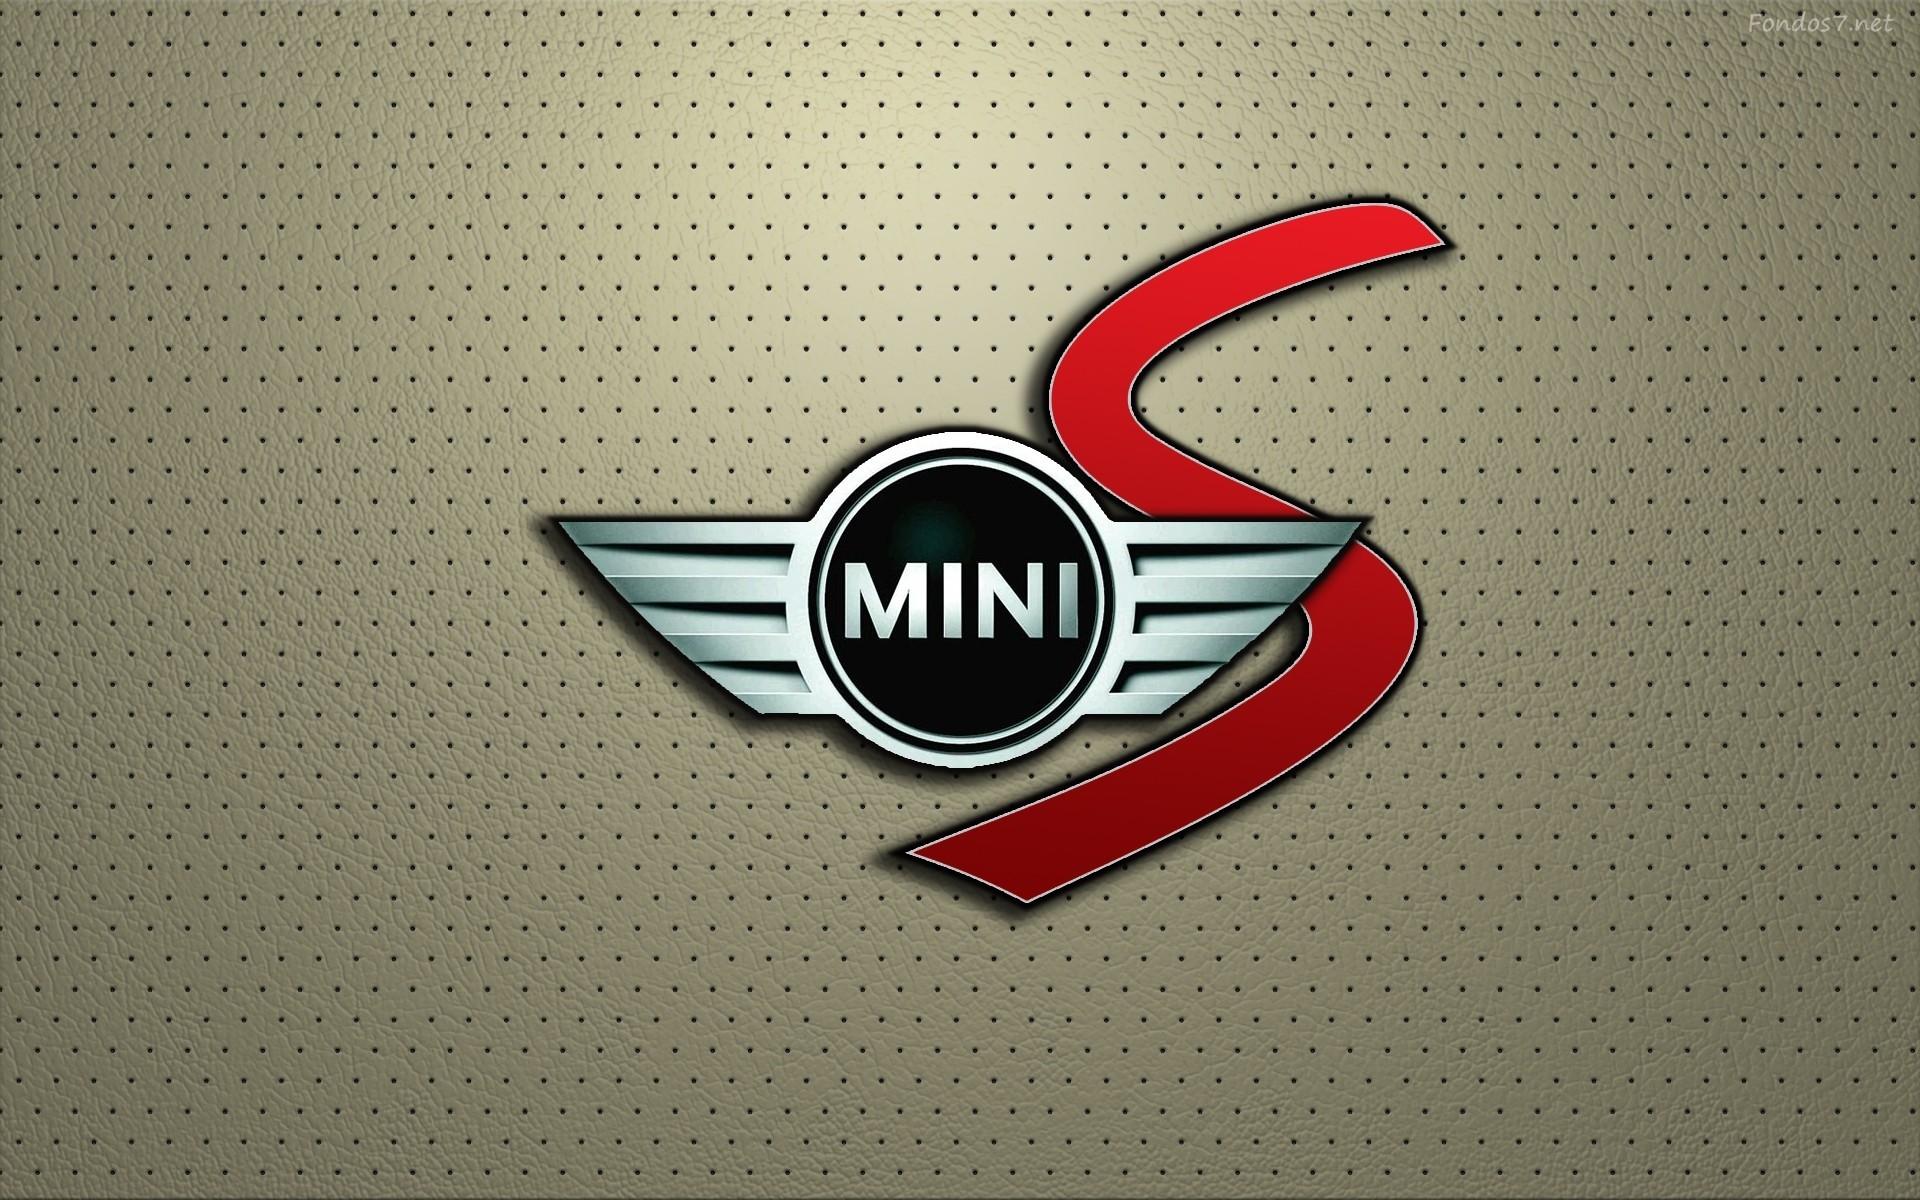 Mini Cooper S Logo in Leather Wallpaper HD Widescreen